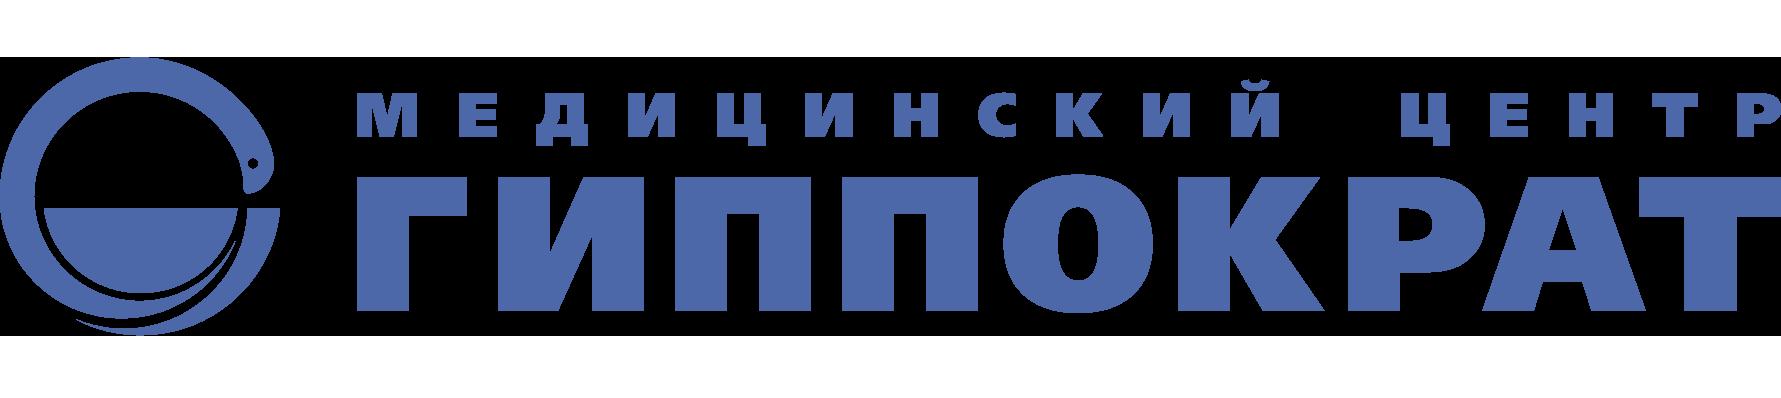 Гиппократ в Таганроге